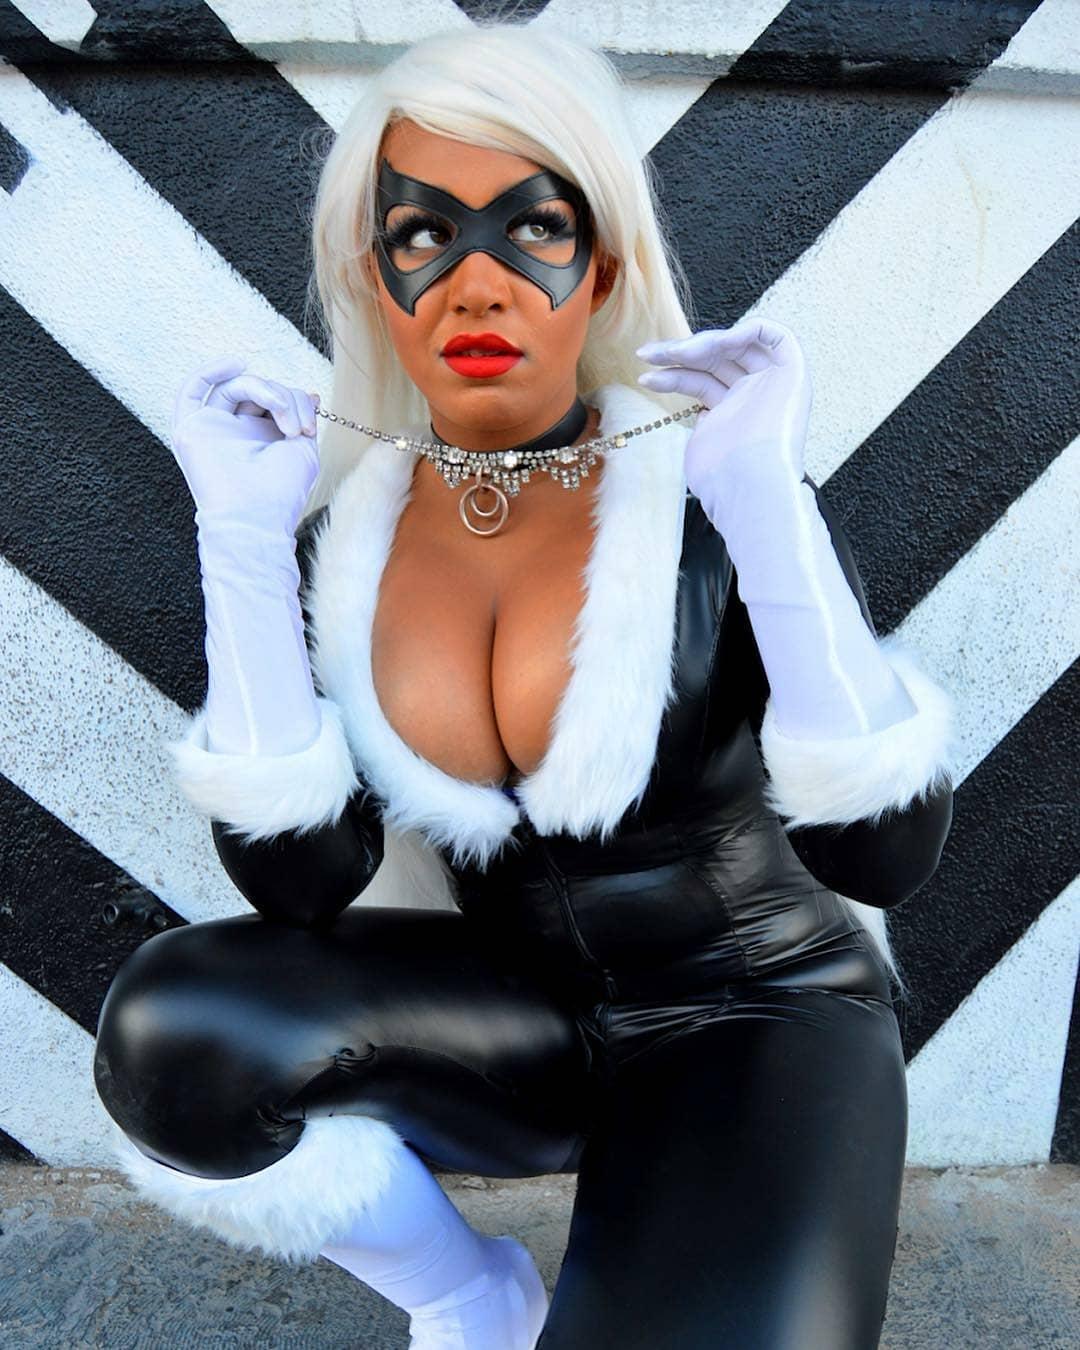 blackcat cosplay by cheyennejazwiseofficial Photo by dr.frankendenim